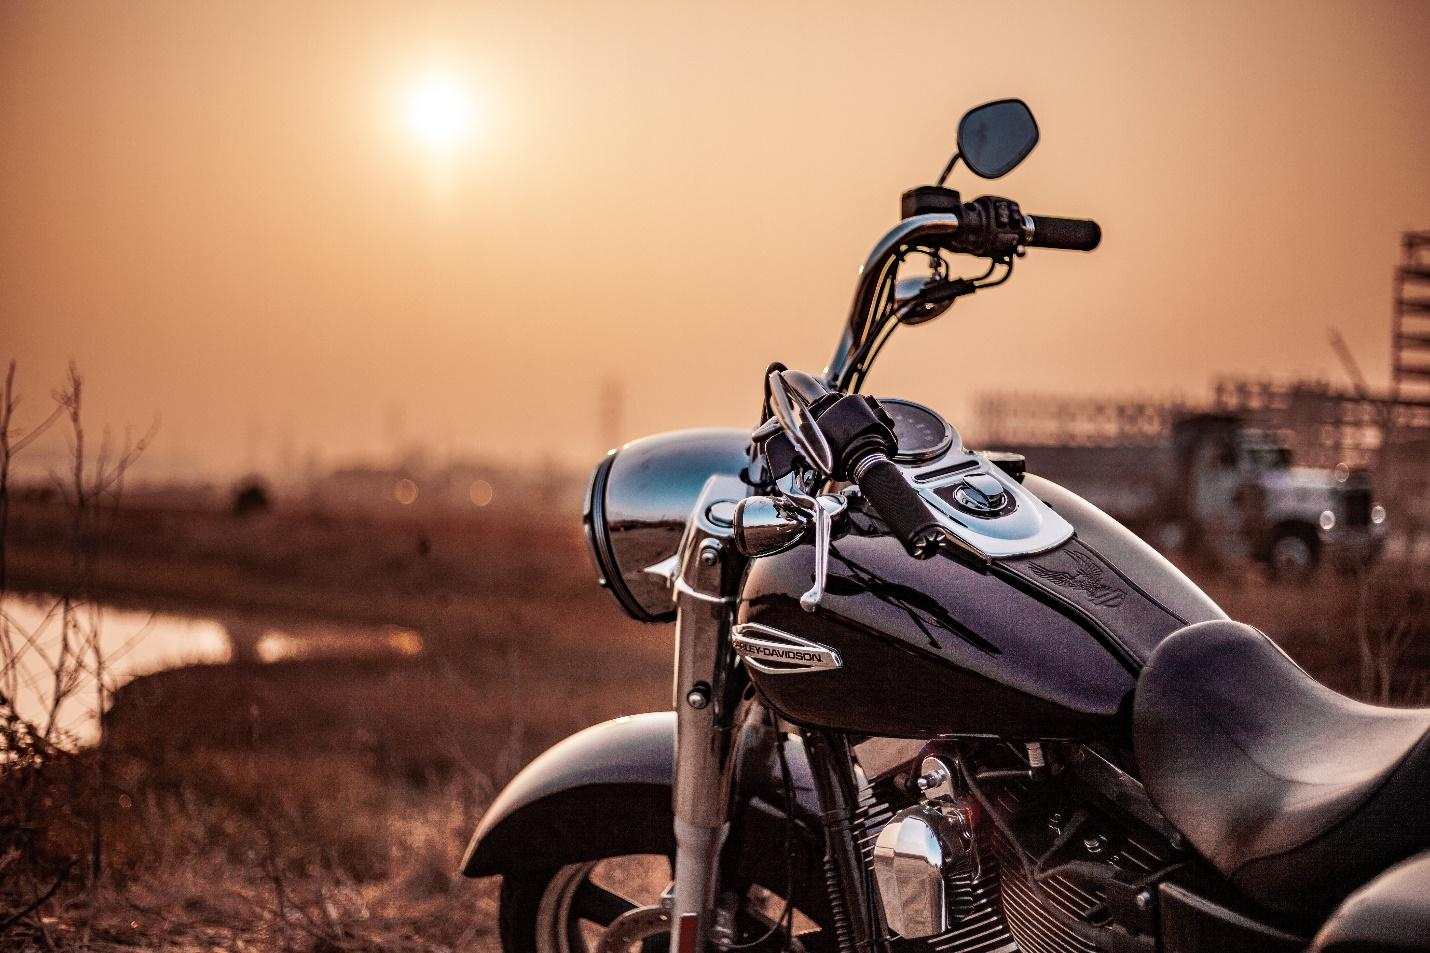 The physics of motorcycle biking